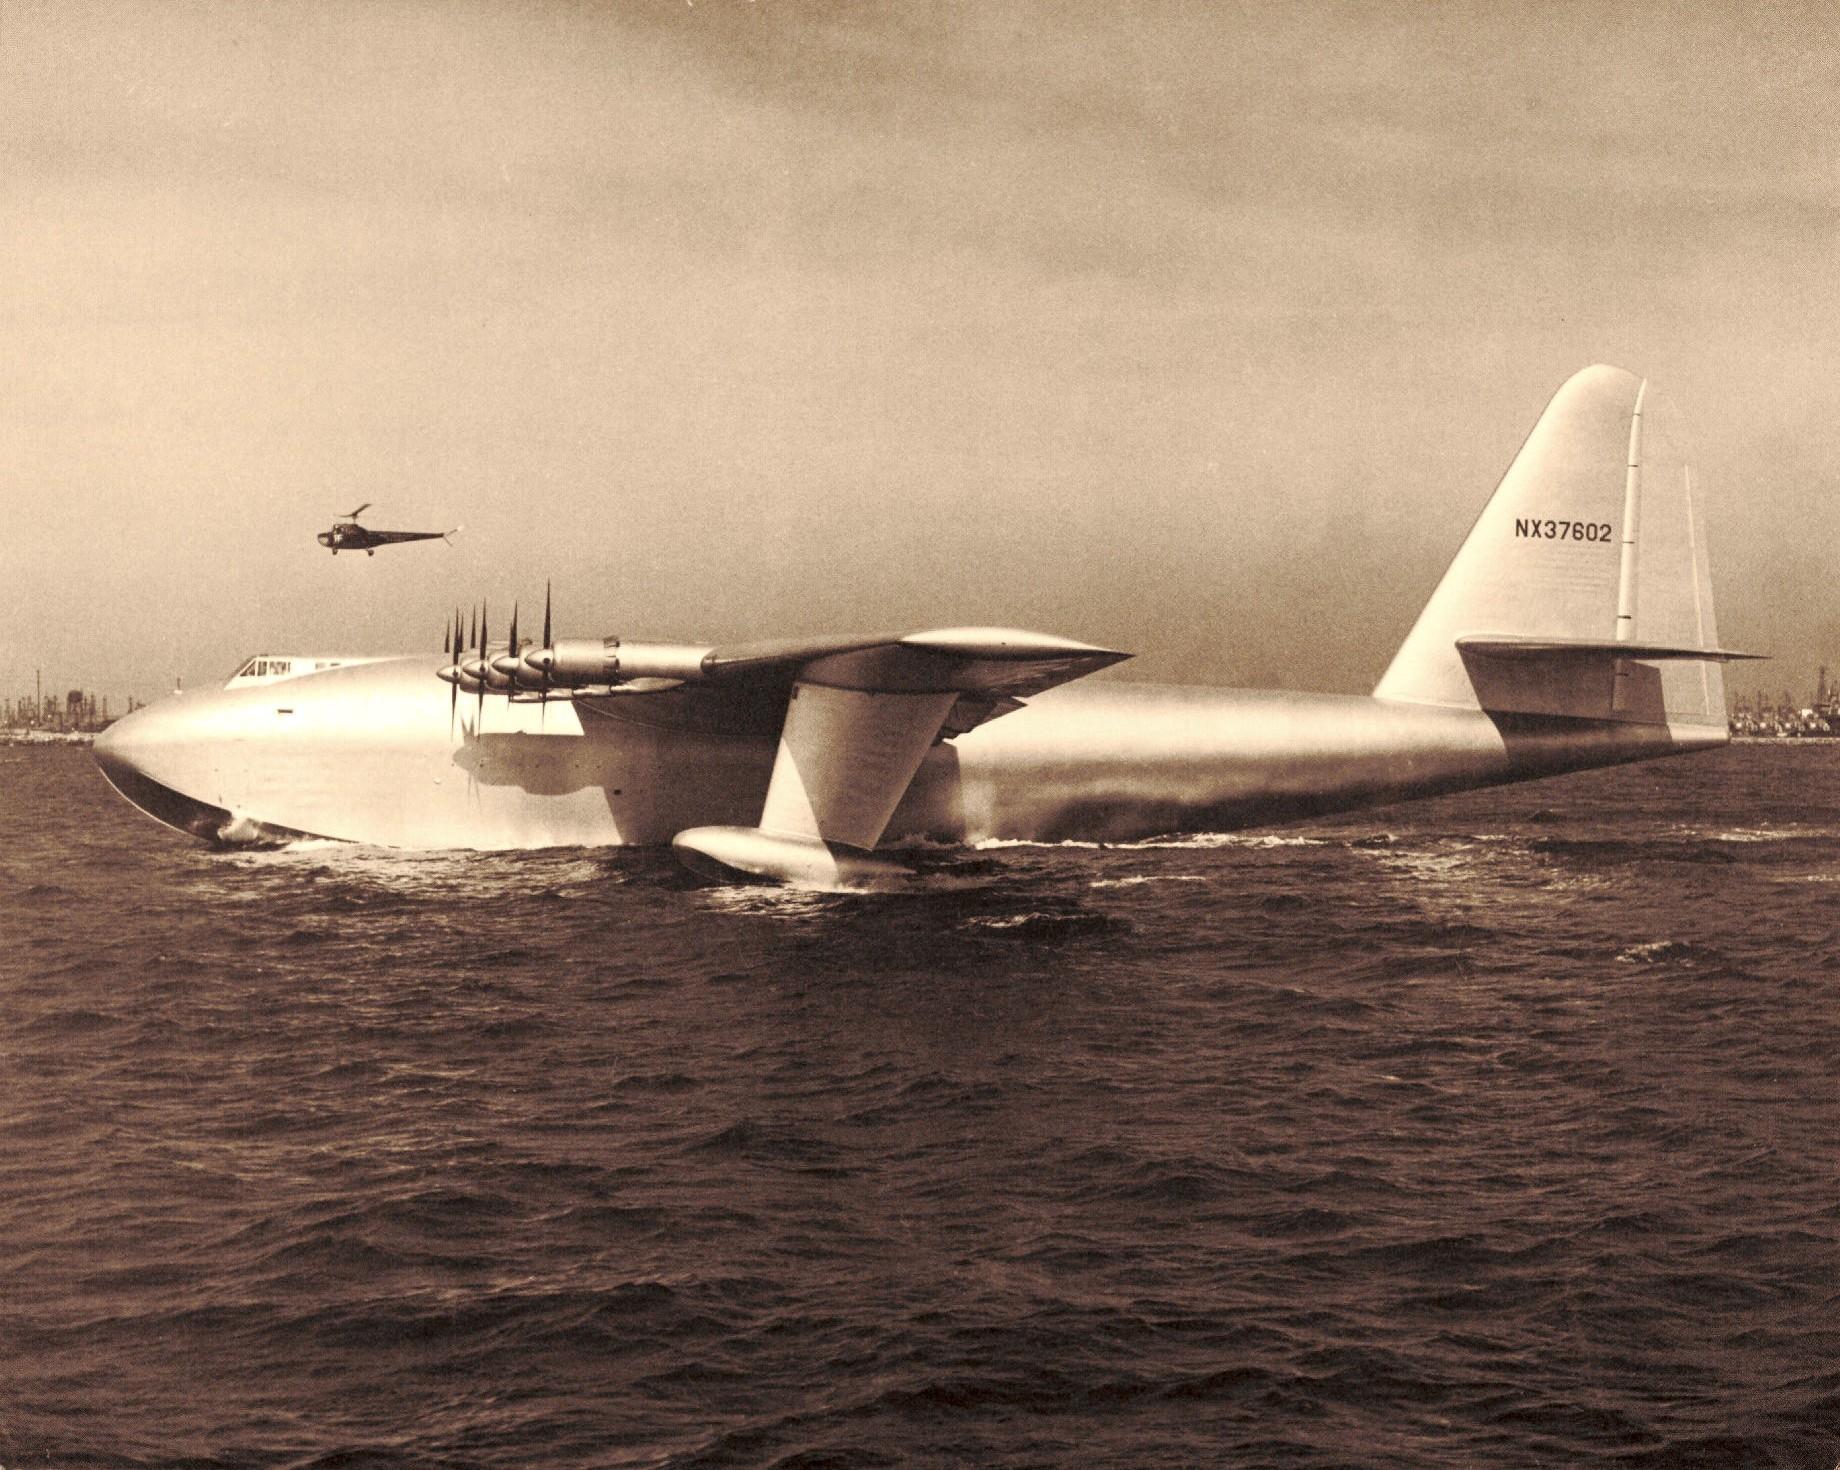 H-4 허큘리스 Hercules